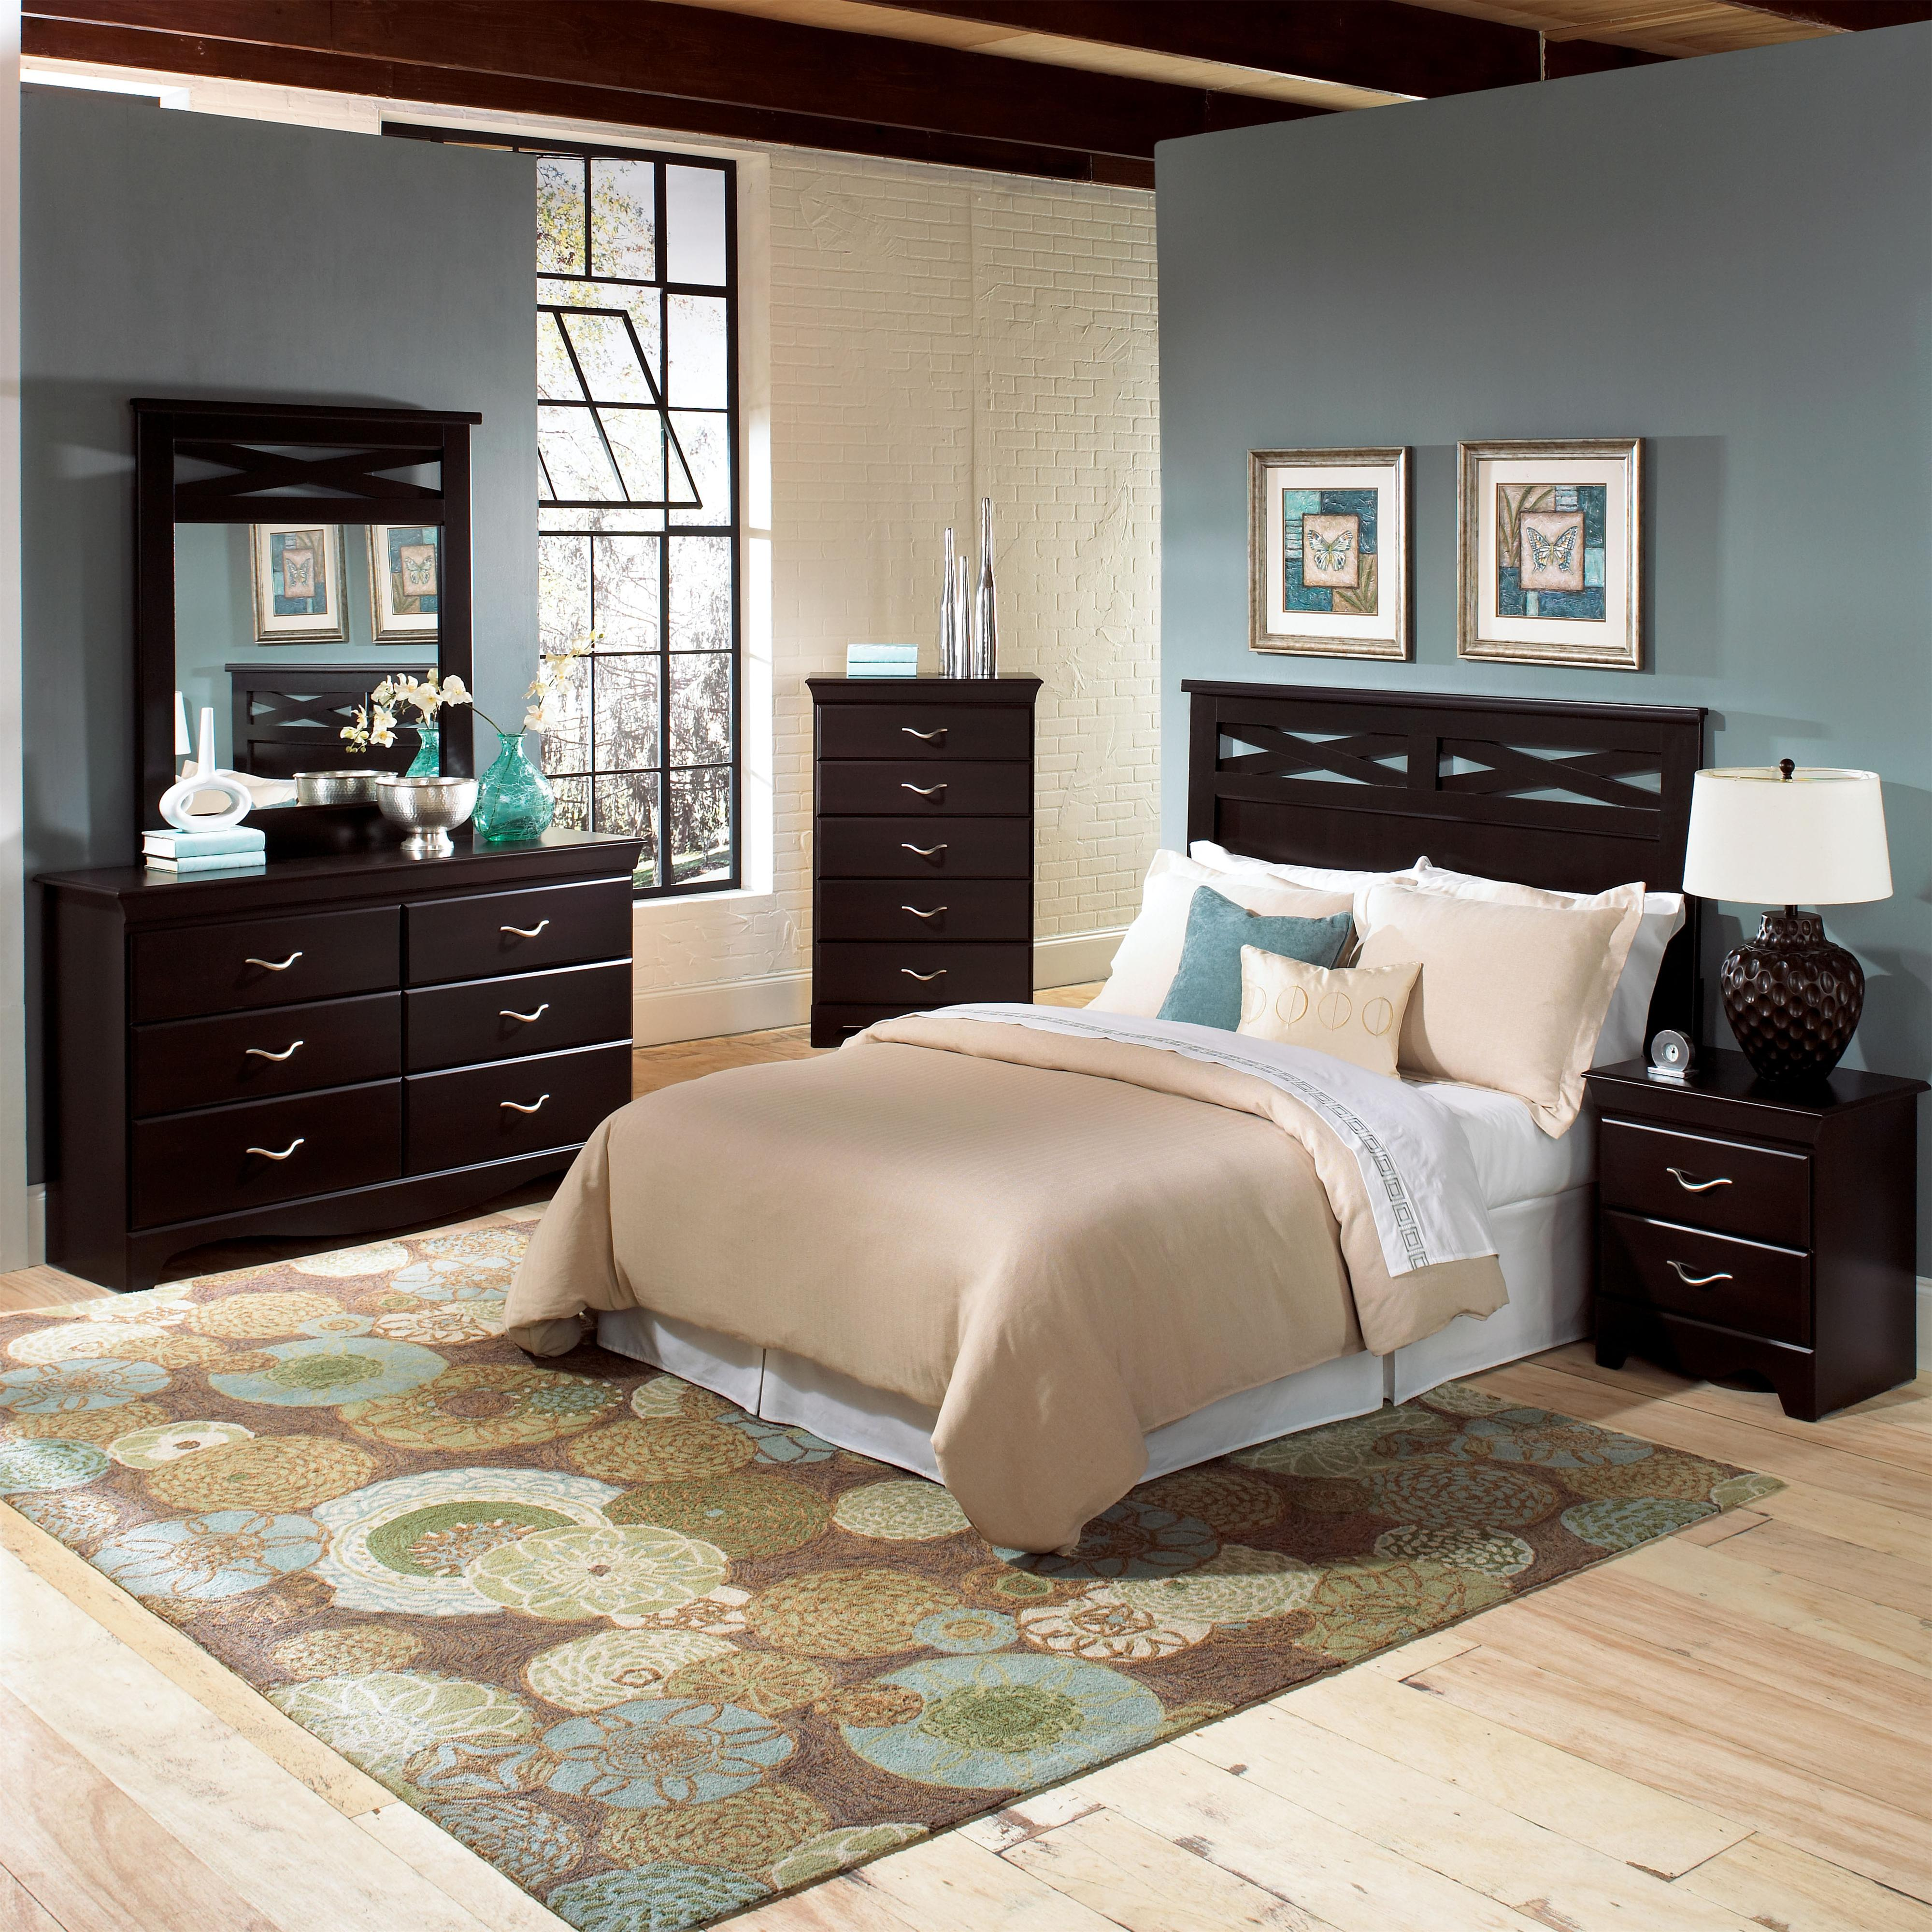 Standard Furniture Crossroads  Full Queen Bedroom Group - Item Number: 57650 F Q Bedroom Group 1